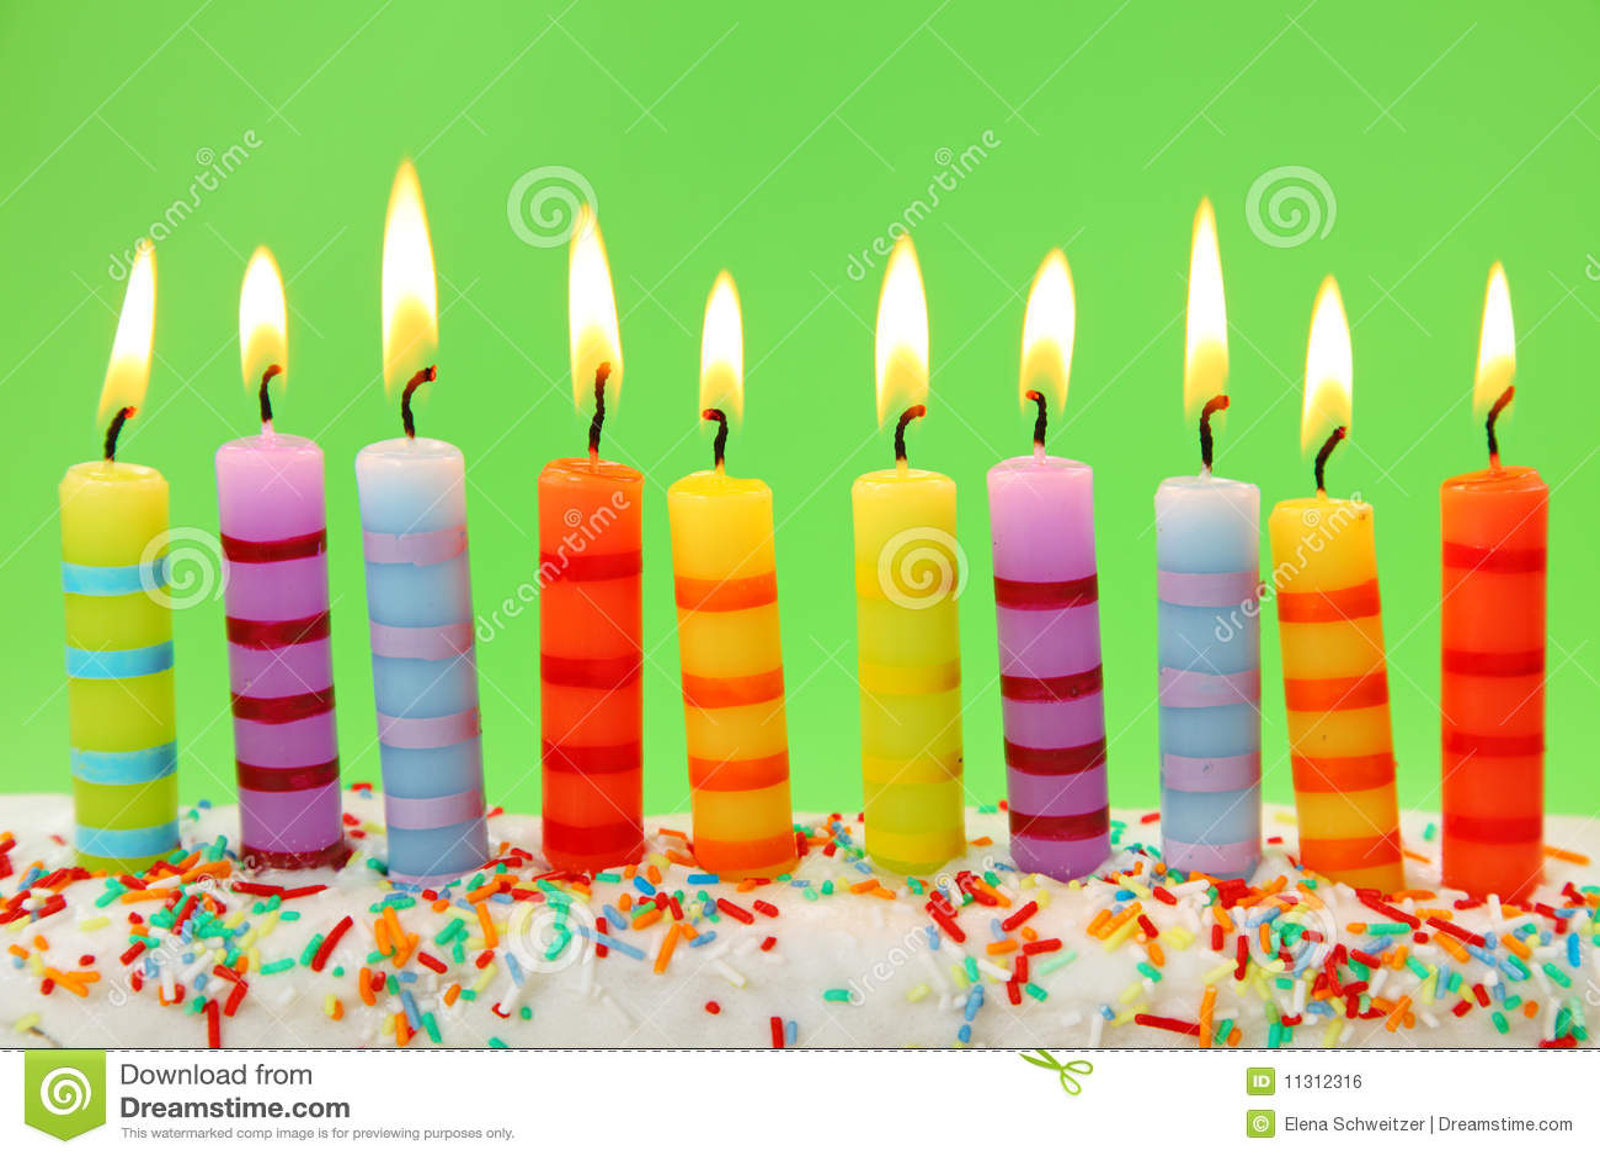 Ten Birthday Candles Royalty Free Stock Image Image